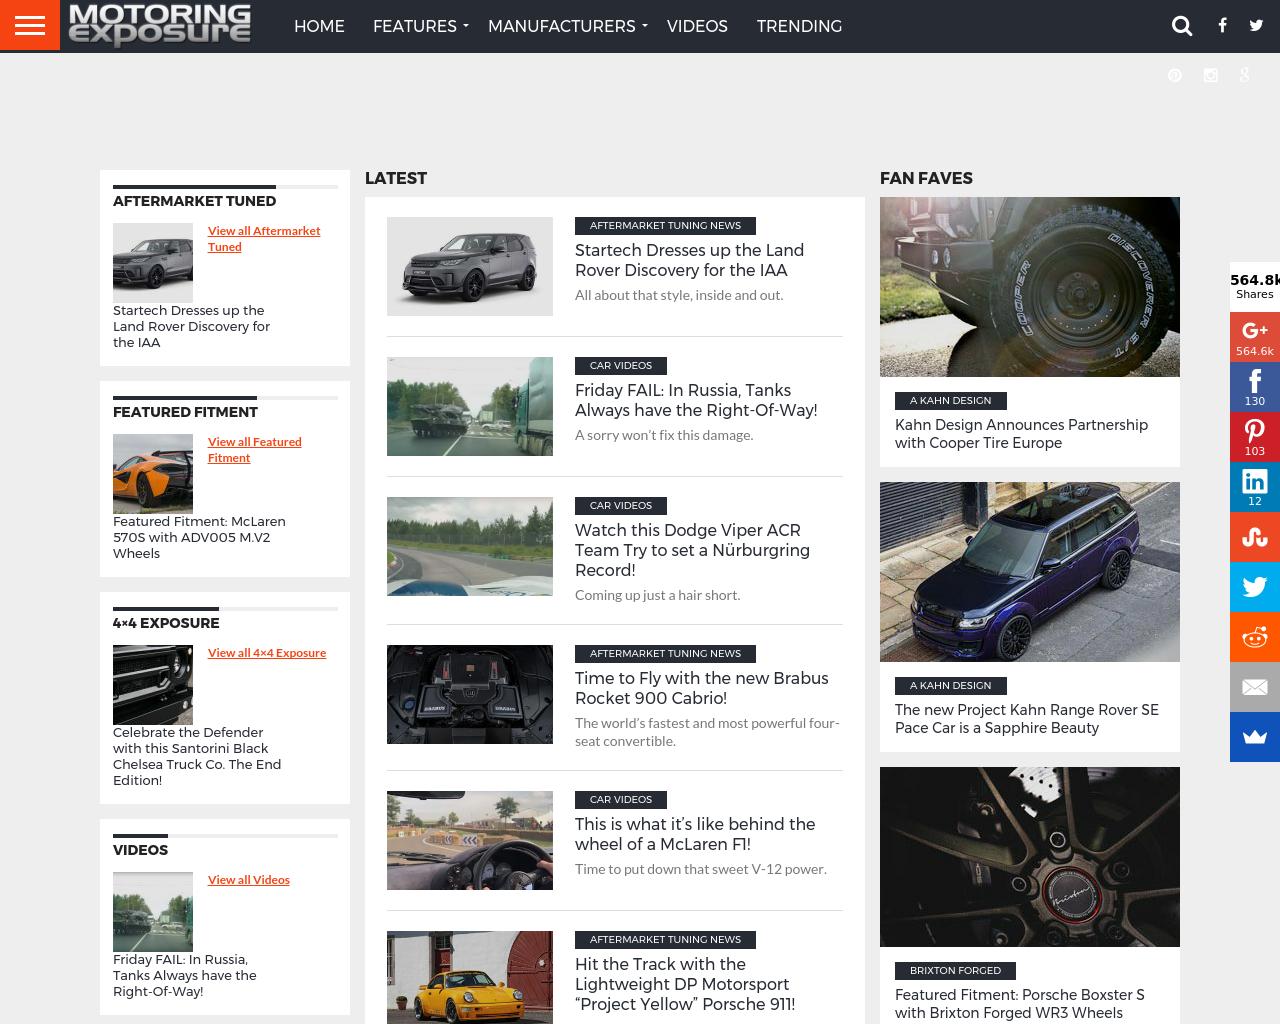 Motoring-Exposure-Advertising-Reviews-Pricing